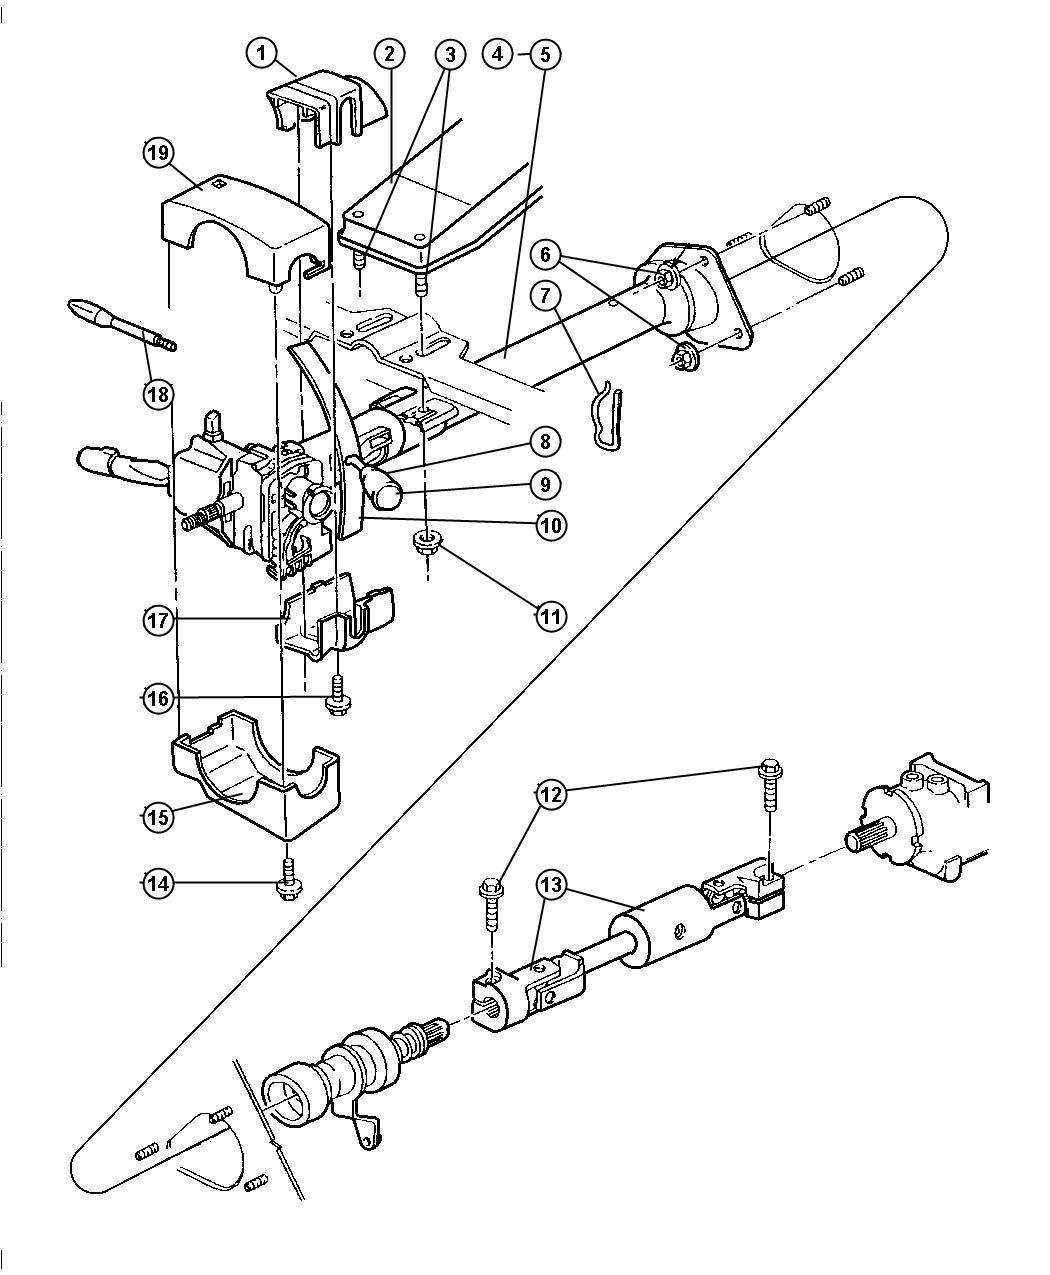 Dodge Ram Grommet Control Rod Front Dhr Conrols